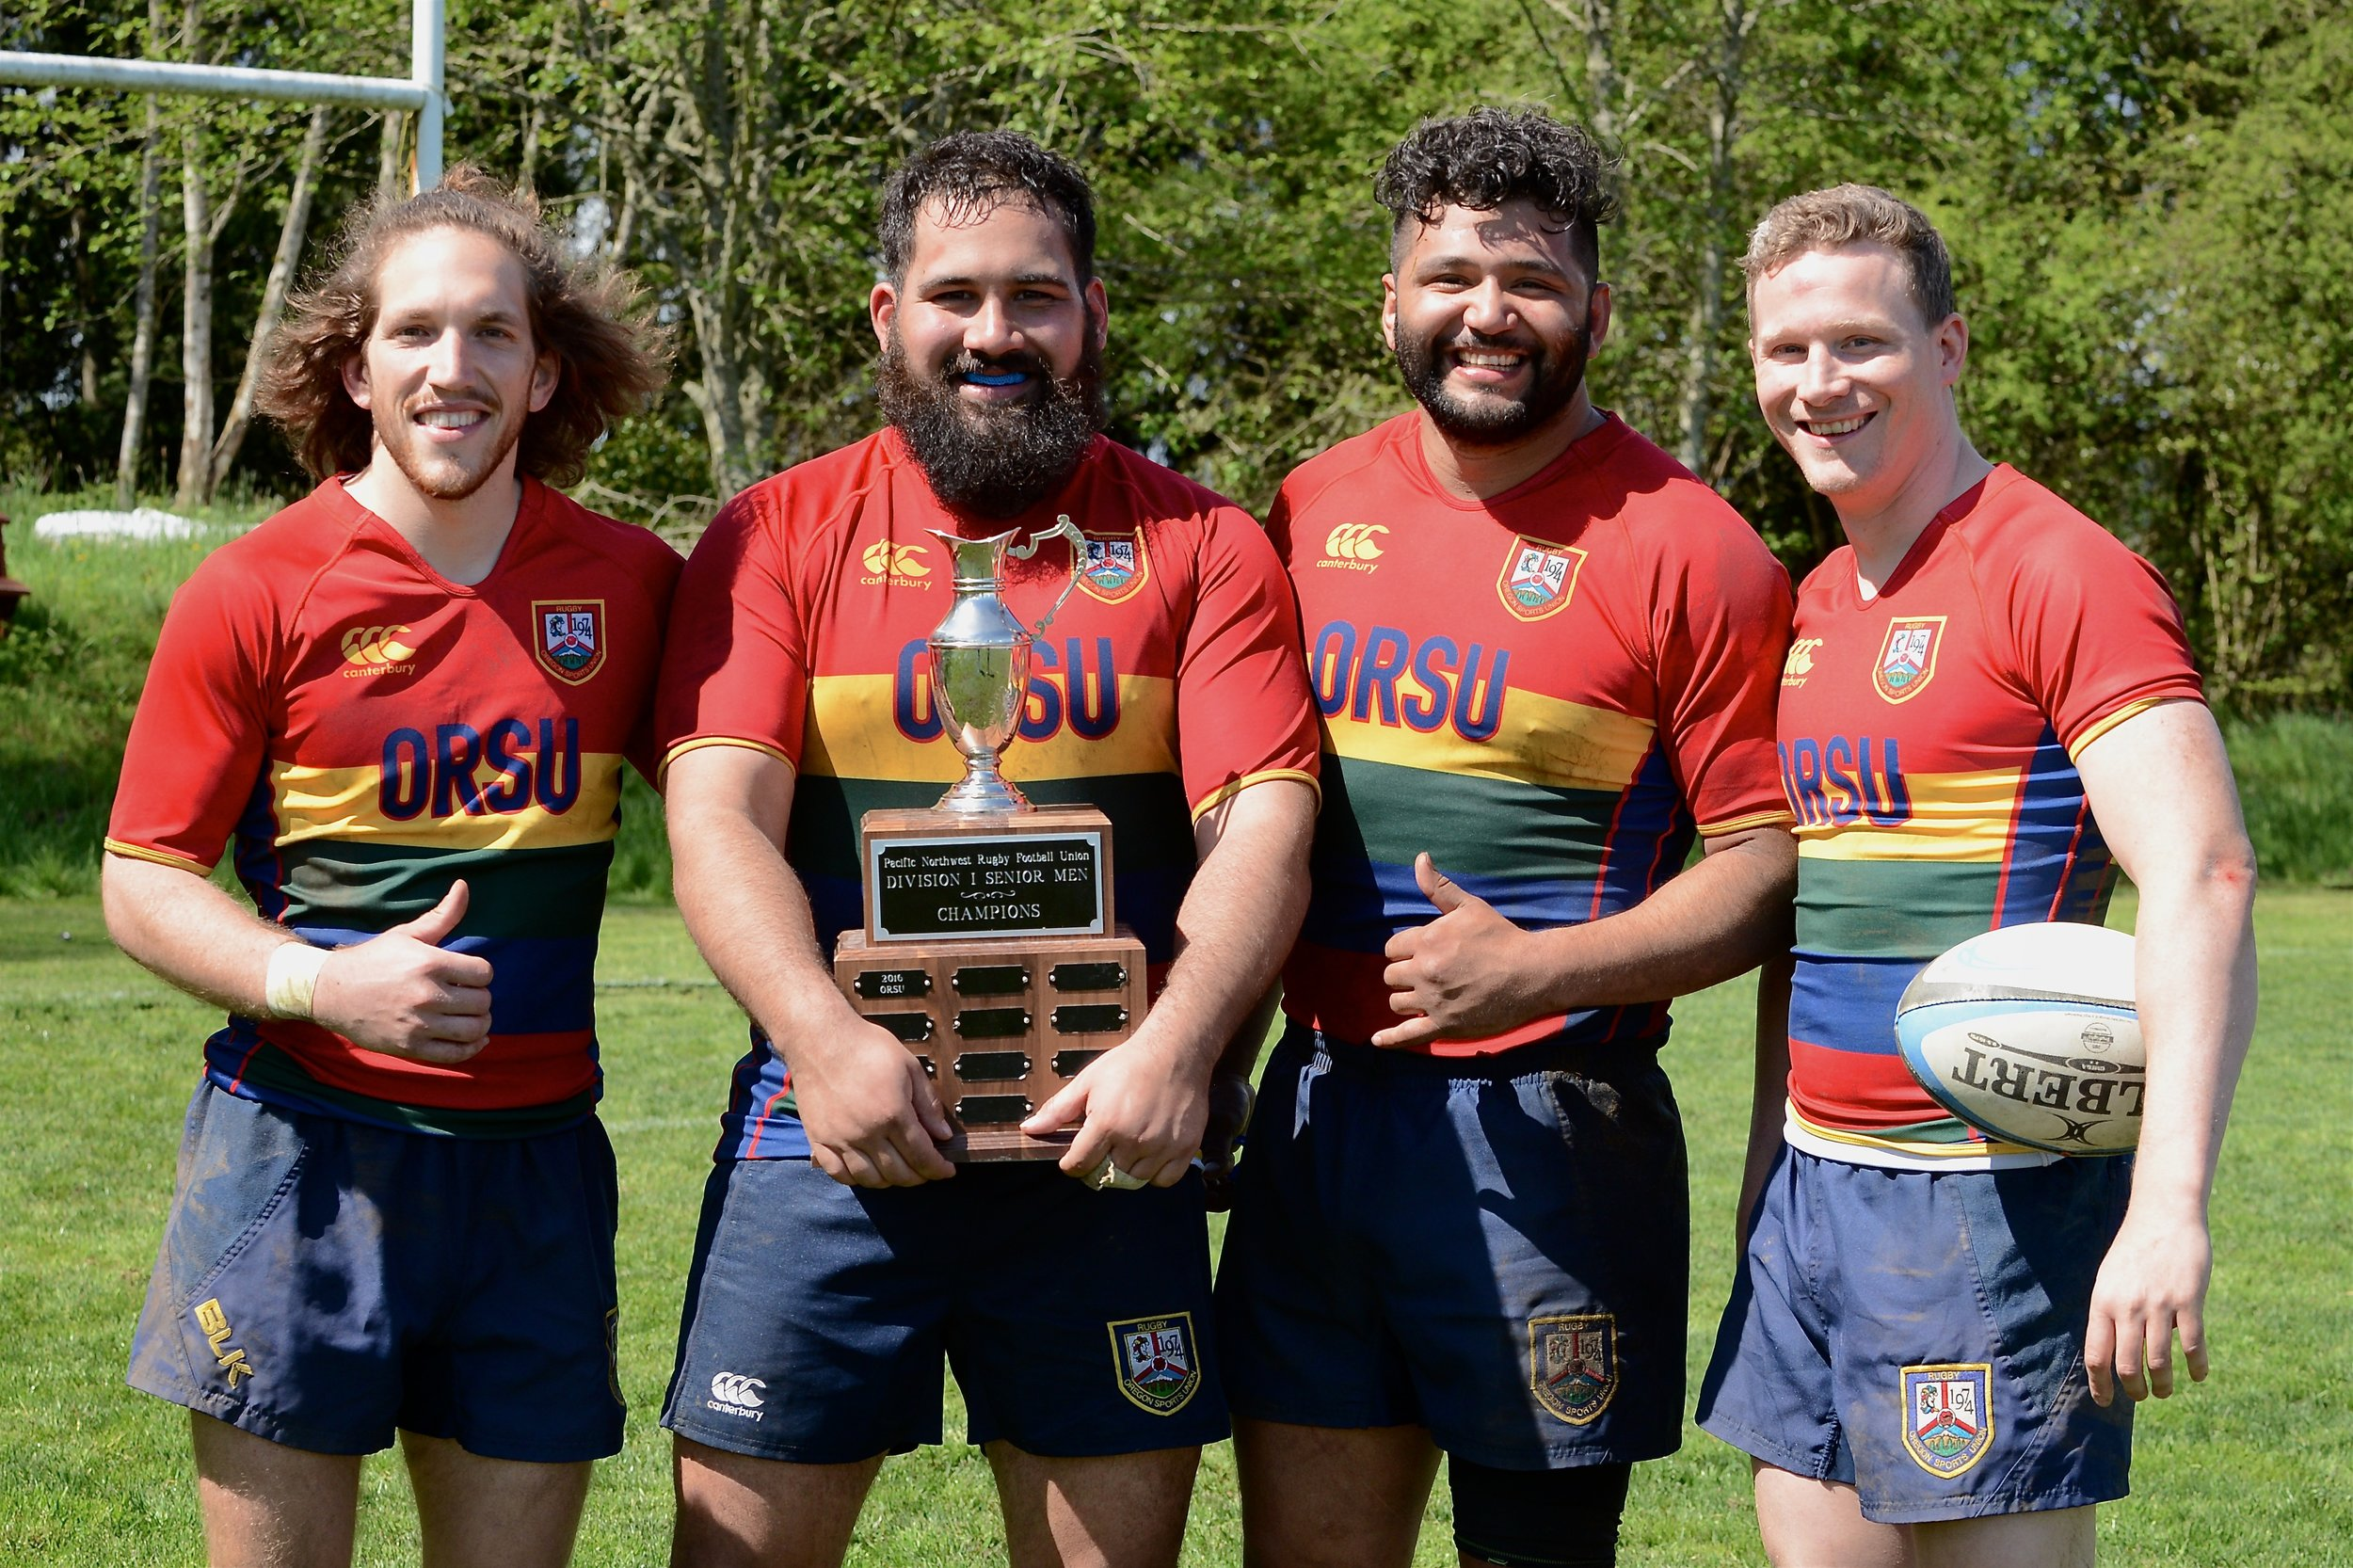 ORSU-Division1-Mens-Portland-Rugby.jpg